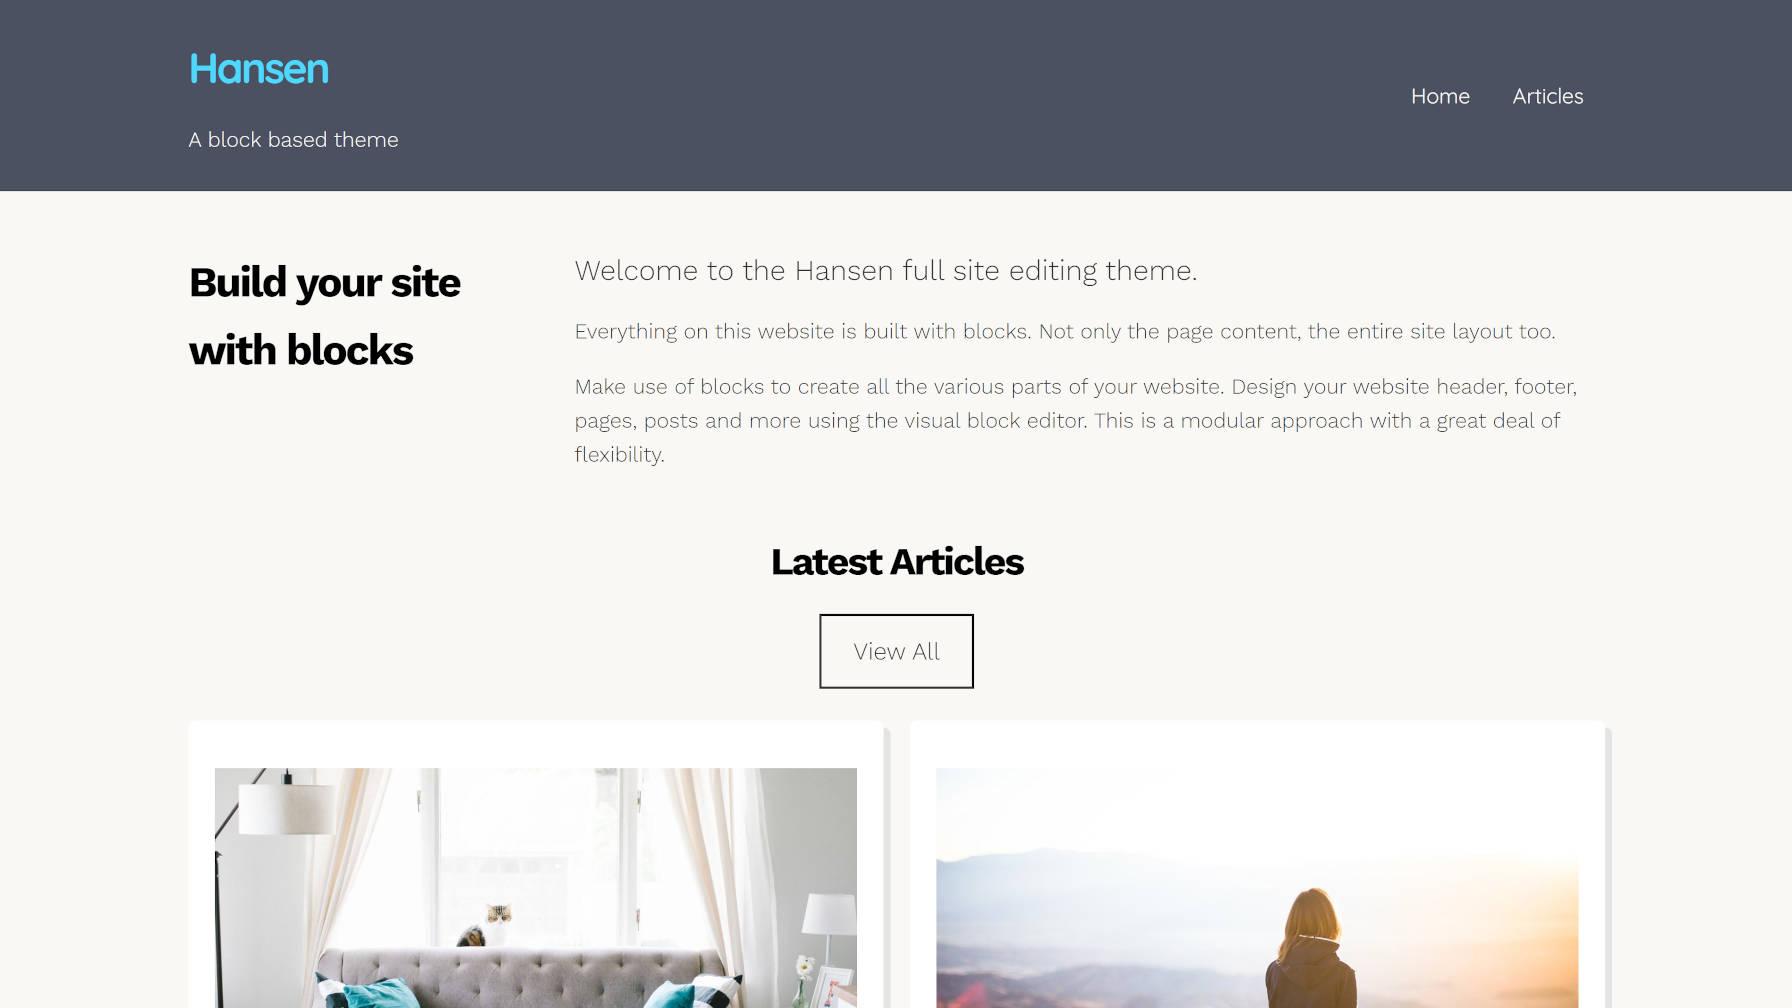 Build a Full WordPress Site via Block Patterns With the Hansen Theme